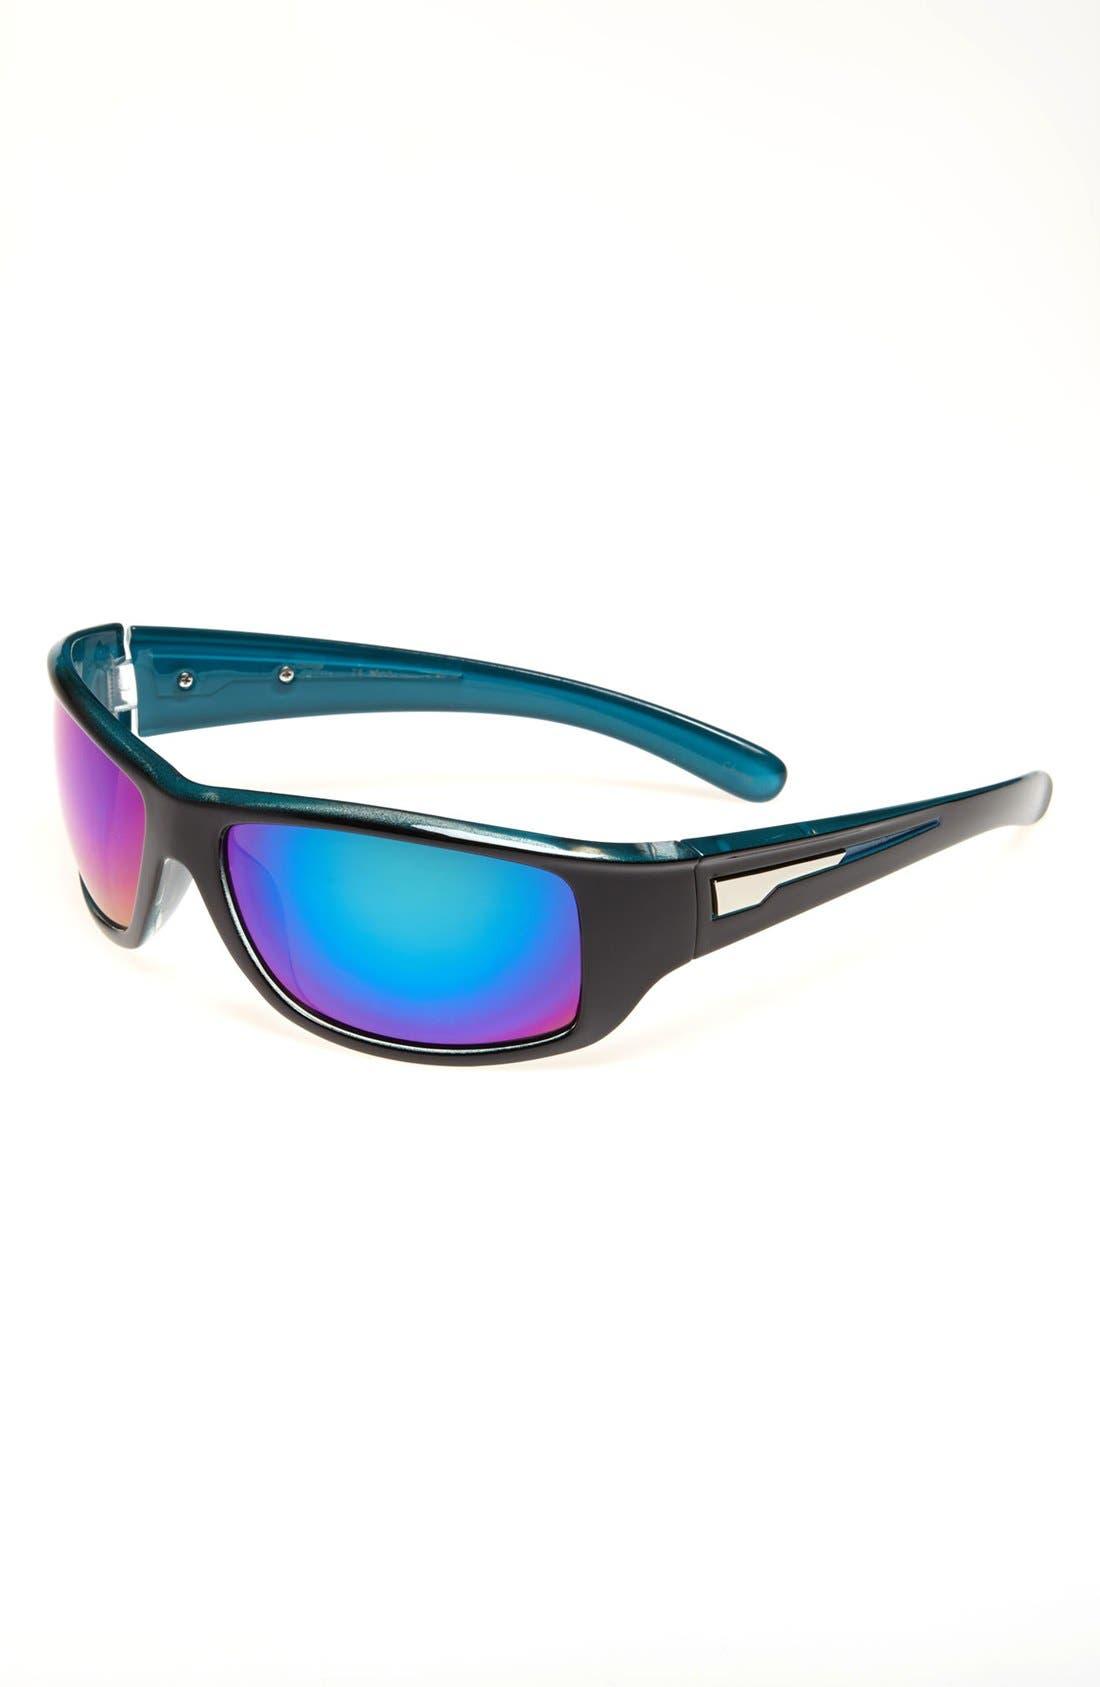 Alternate Image 1 Selected - Icon Eyewear Sport Wrap Sunglasses (Boys)